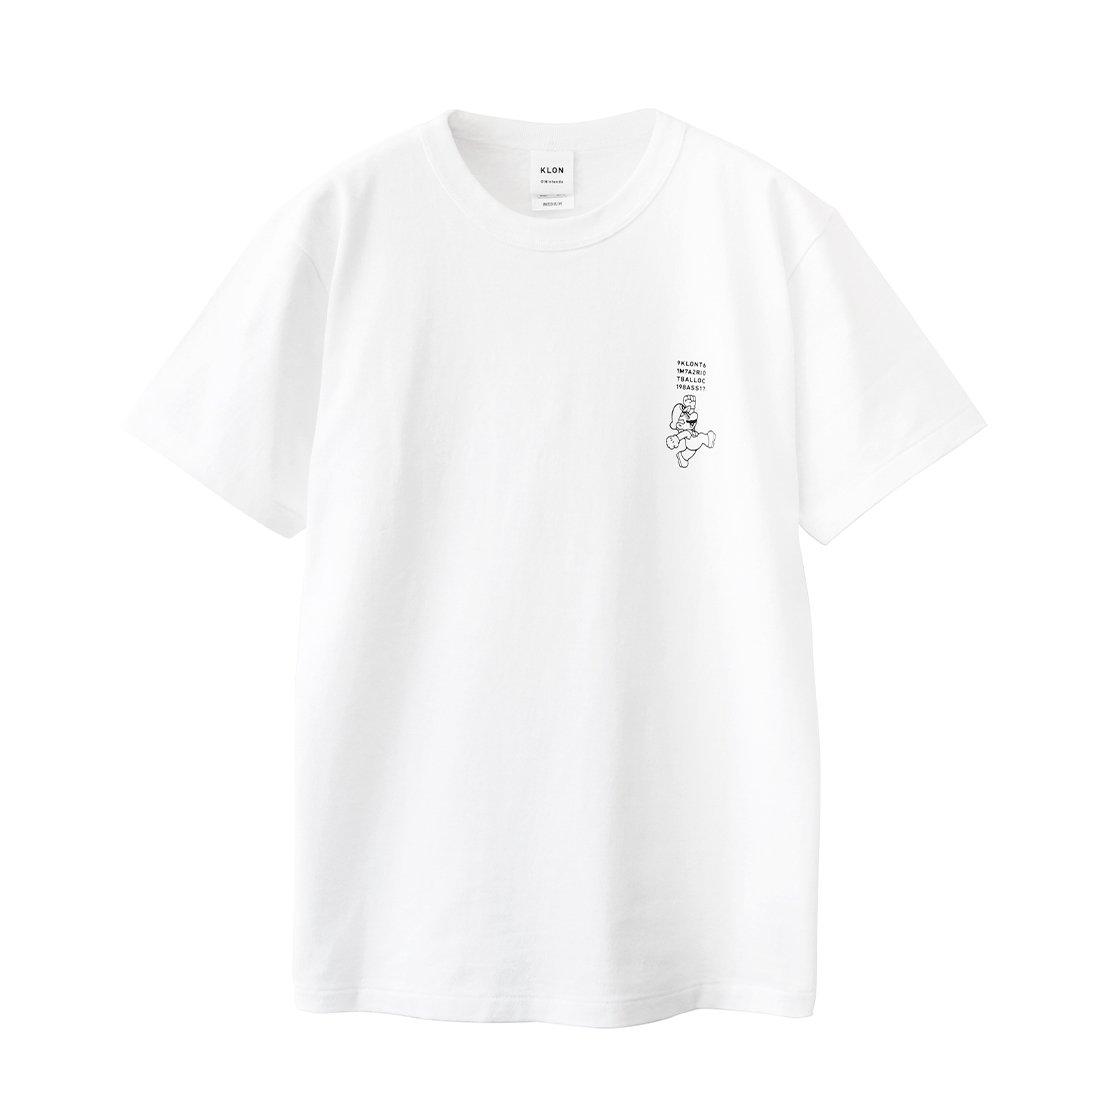 KLON Tshirts Jump(SUPER MARIO)